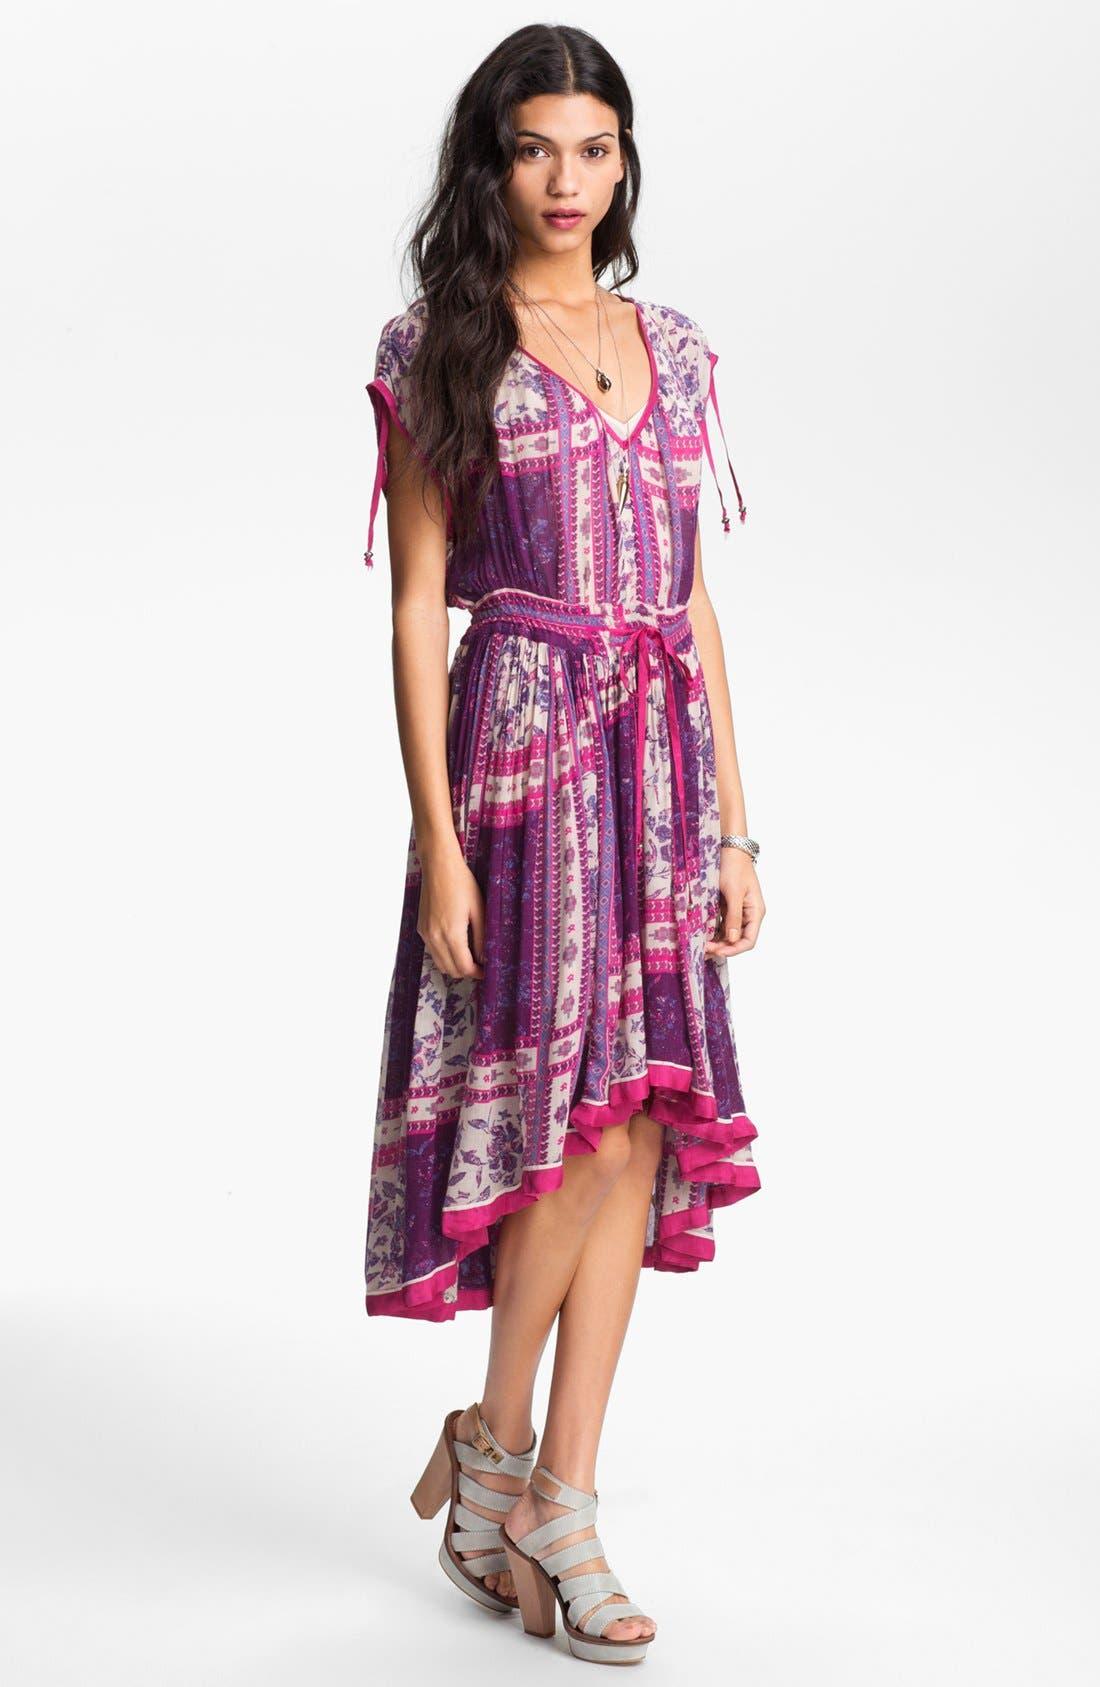 Alternate Image 1 Selected - Free People 'Rose Garden' Print Peasant Dress